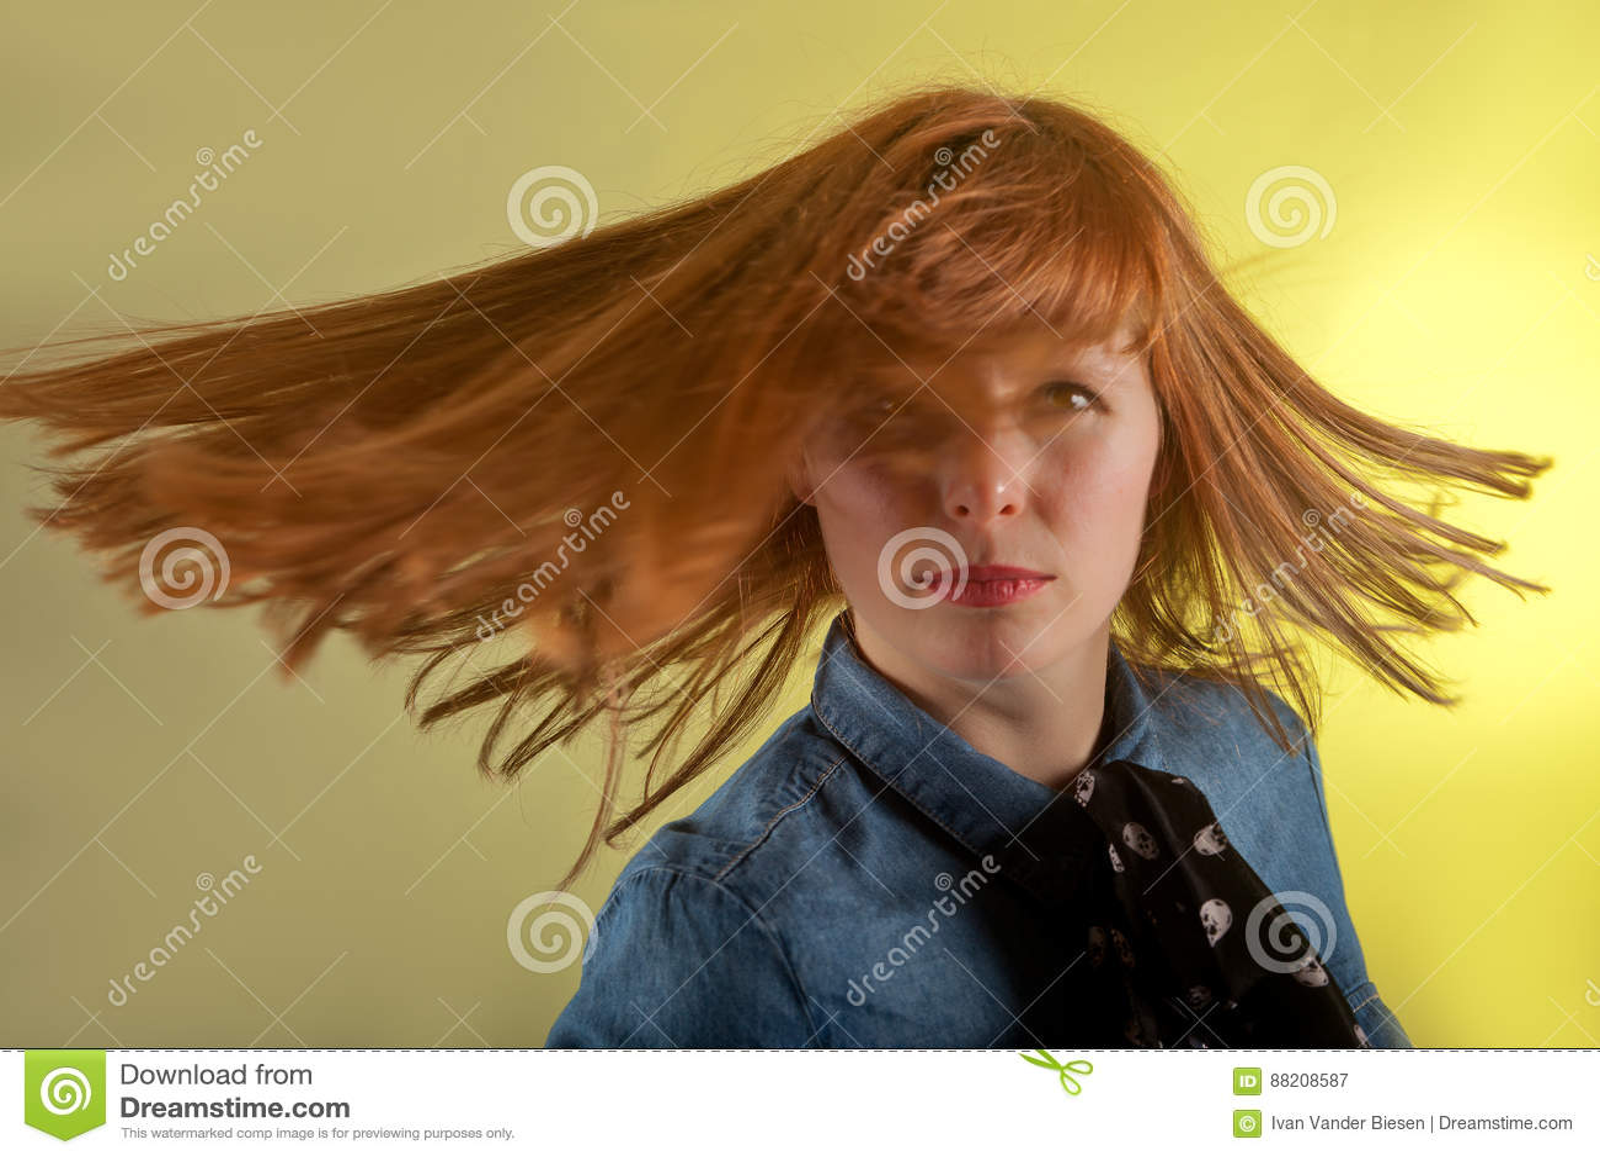 Предпосылка желтого цвета девушки Redhead